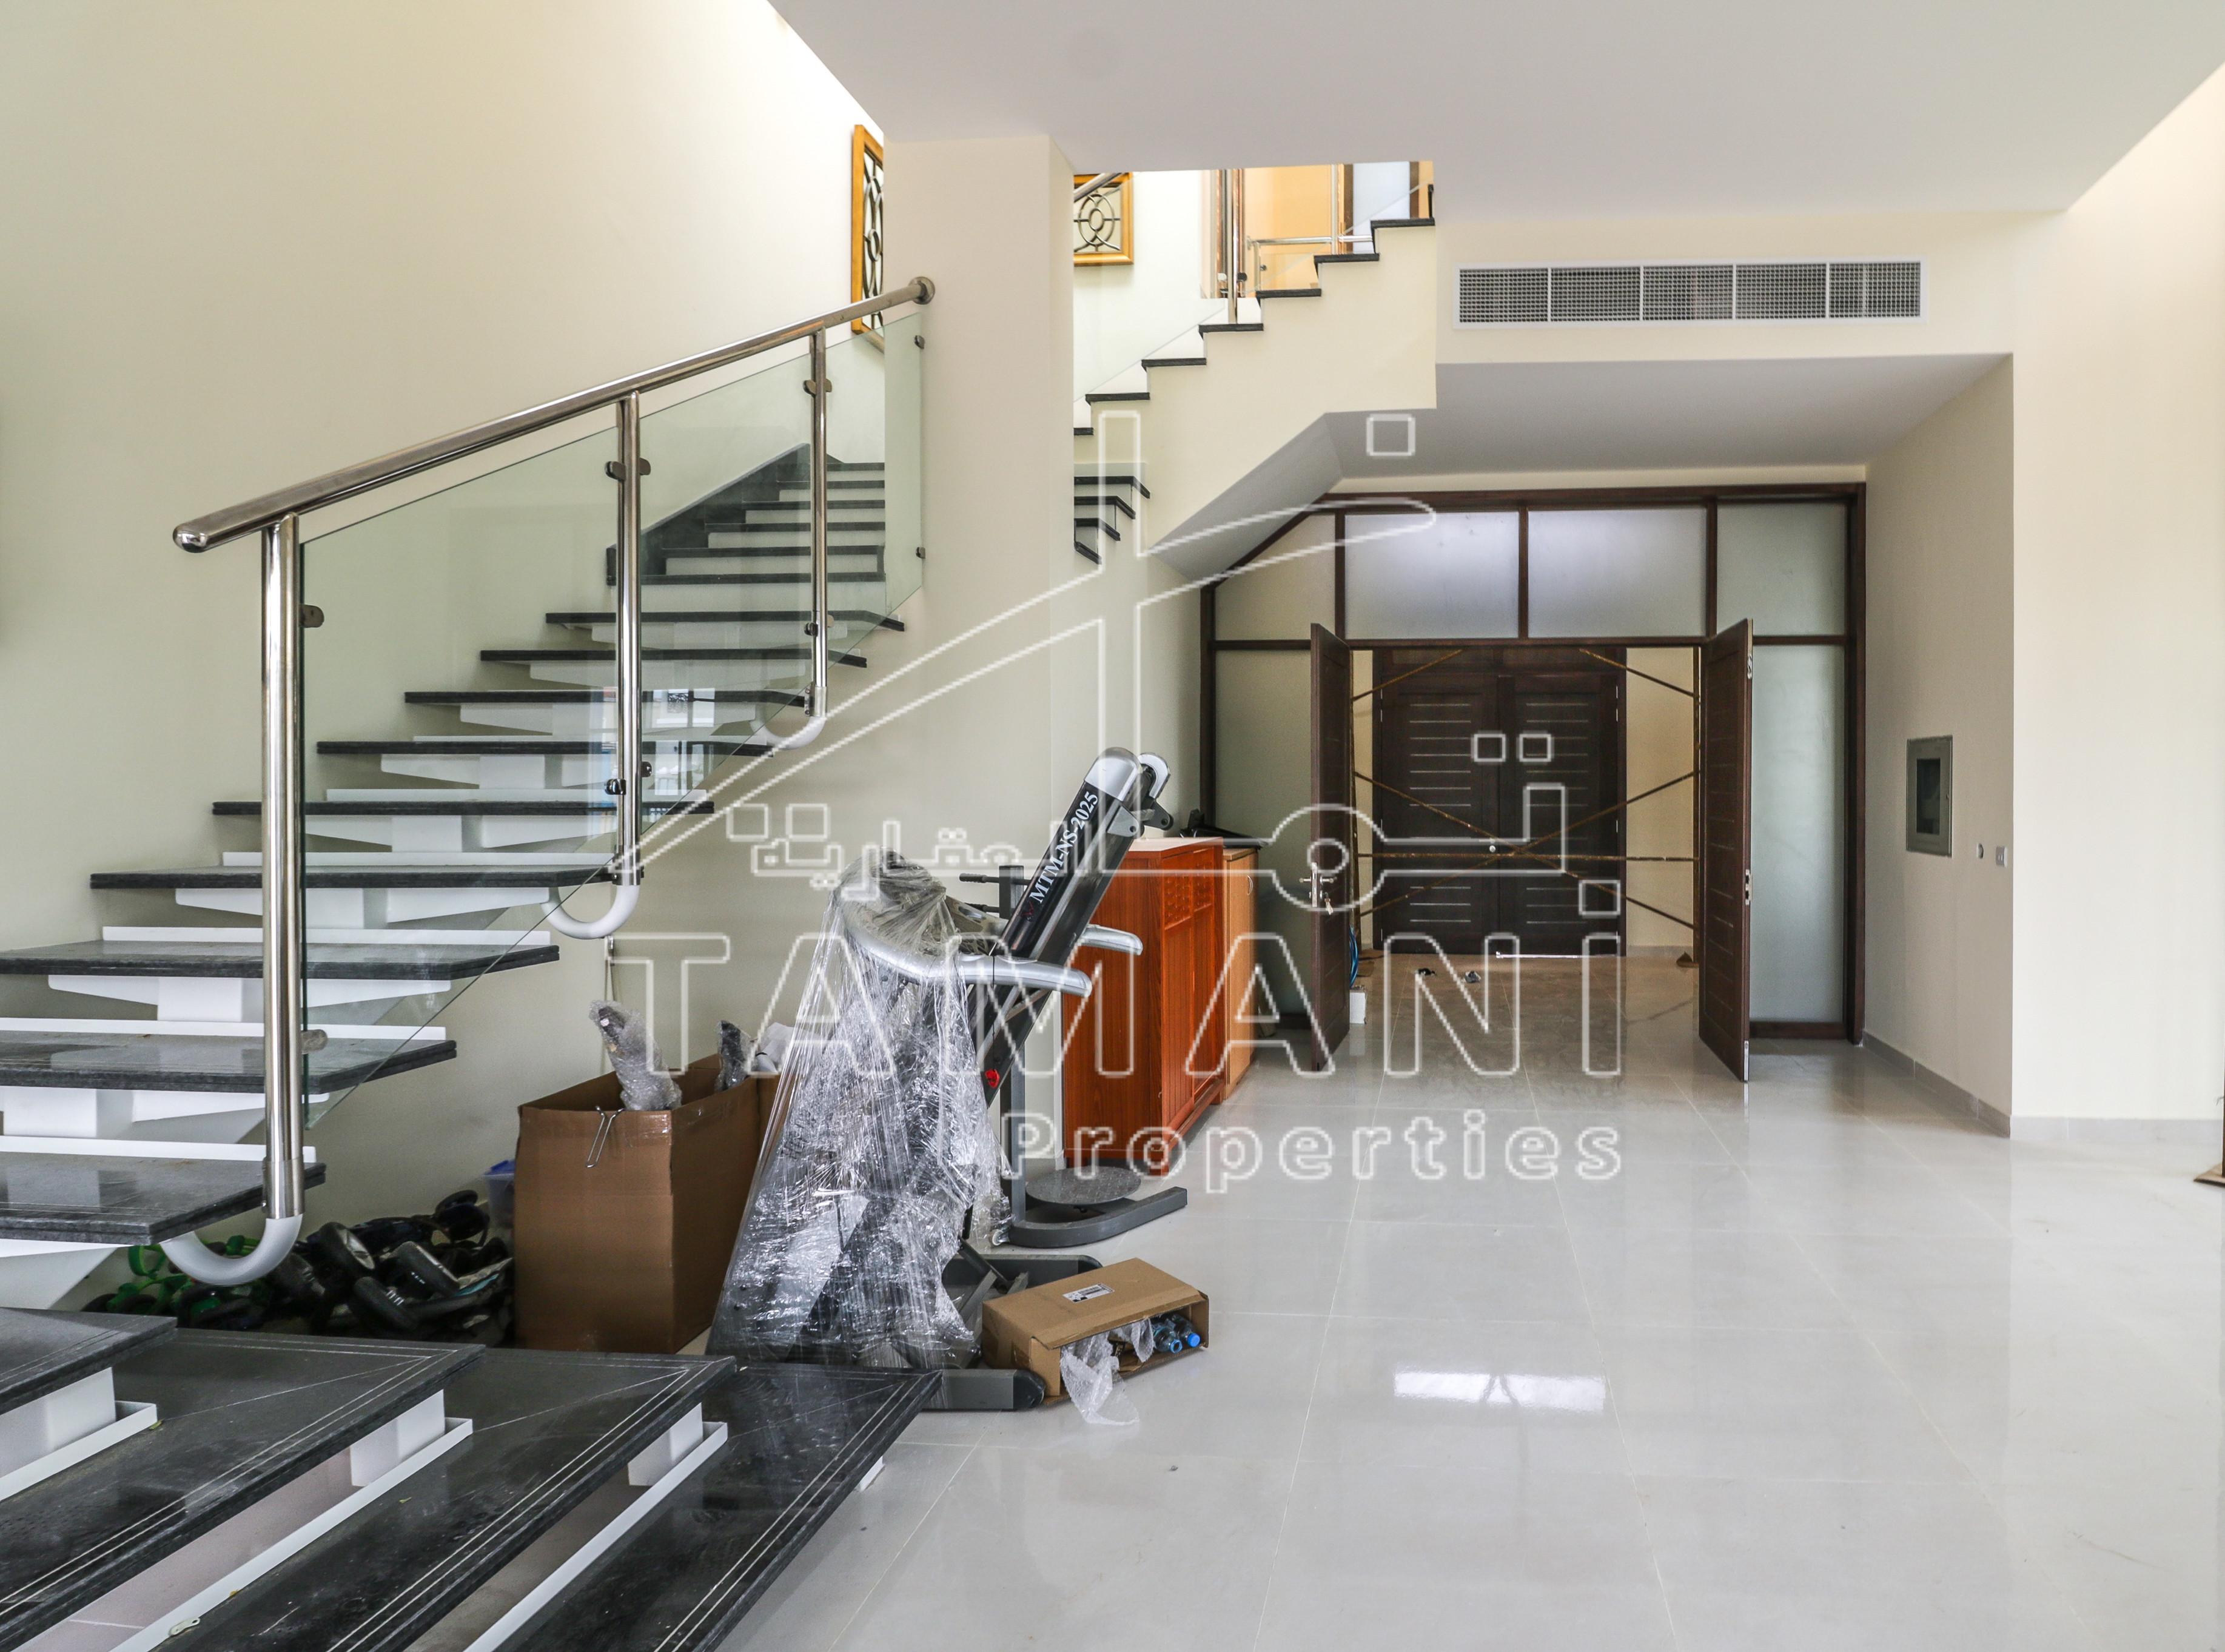 10K Plot |High Quality |Brand New Custom - Hacienda